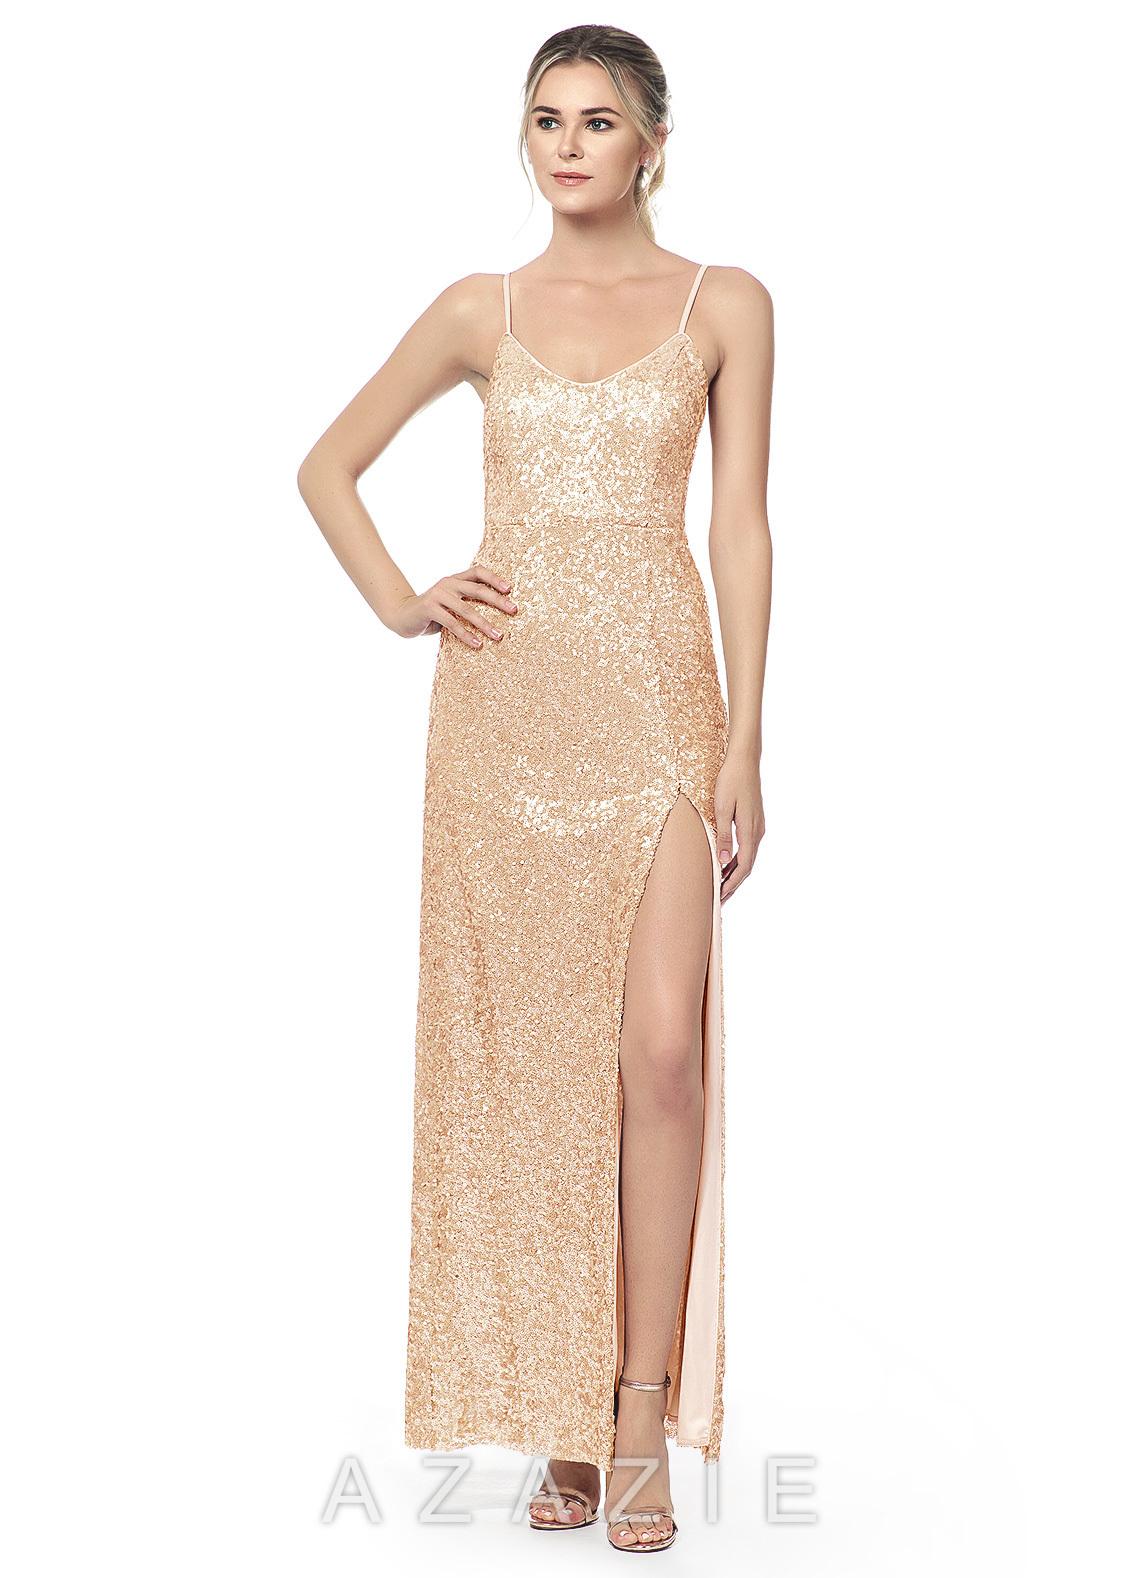 4ad21a68f16d3 Azazie Dayana Bridesmaid Dress | Azazie